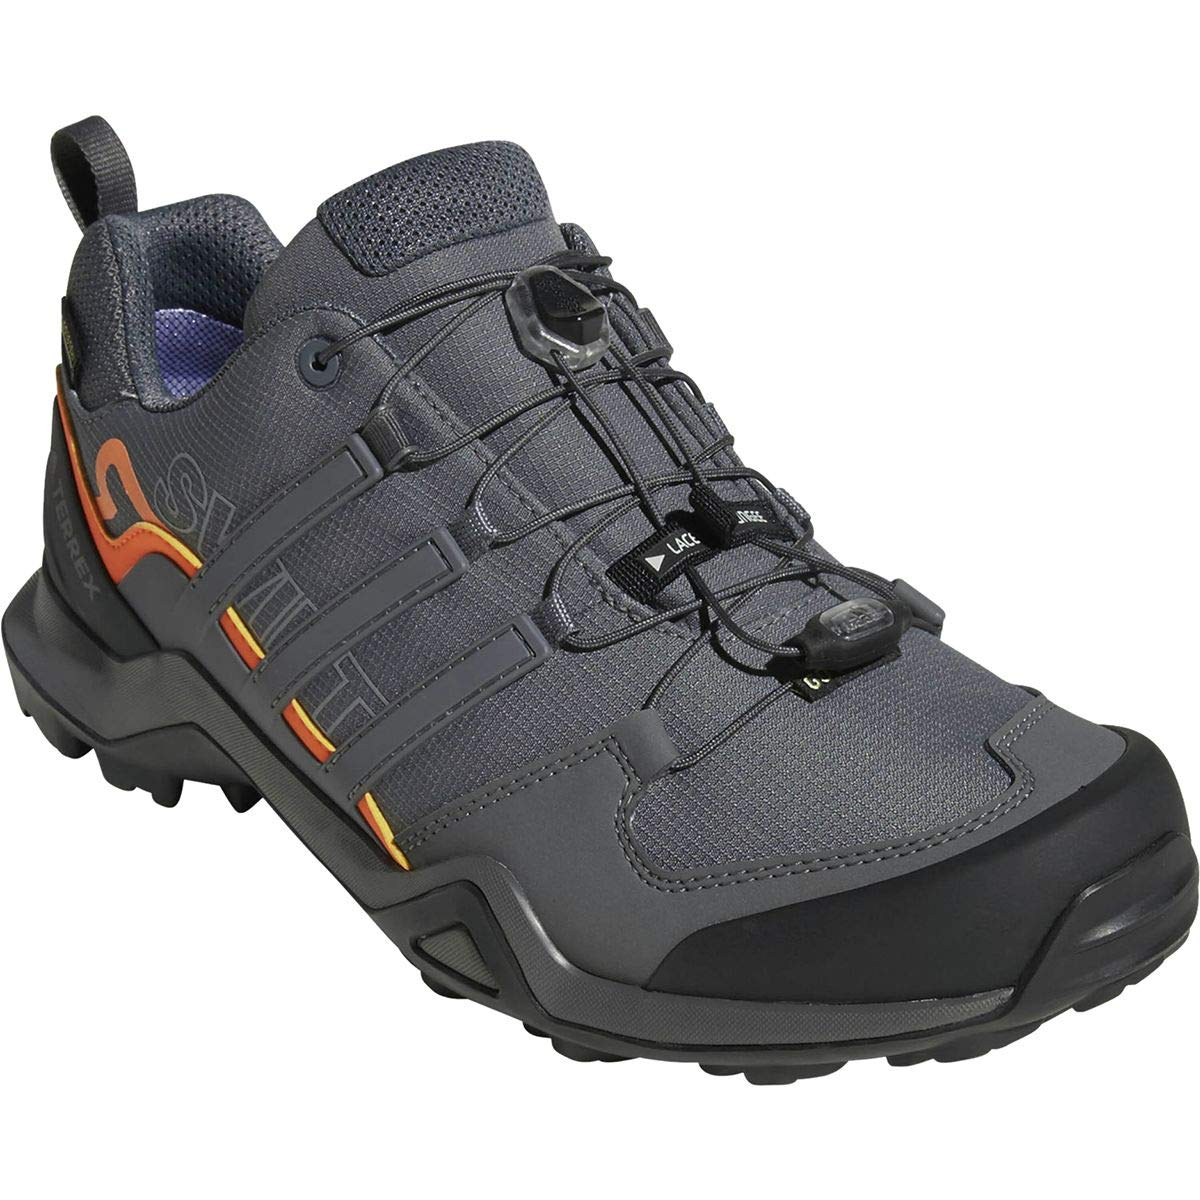 the latest 7c7f8 844a7 Amazon.com  adidas outdoor Mens Terrex Swift R2 GTX  Hiking